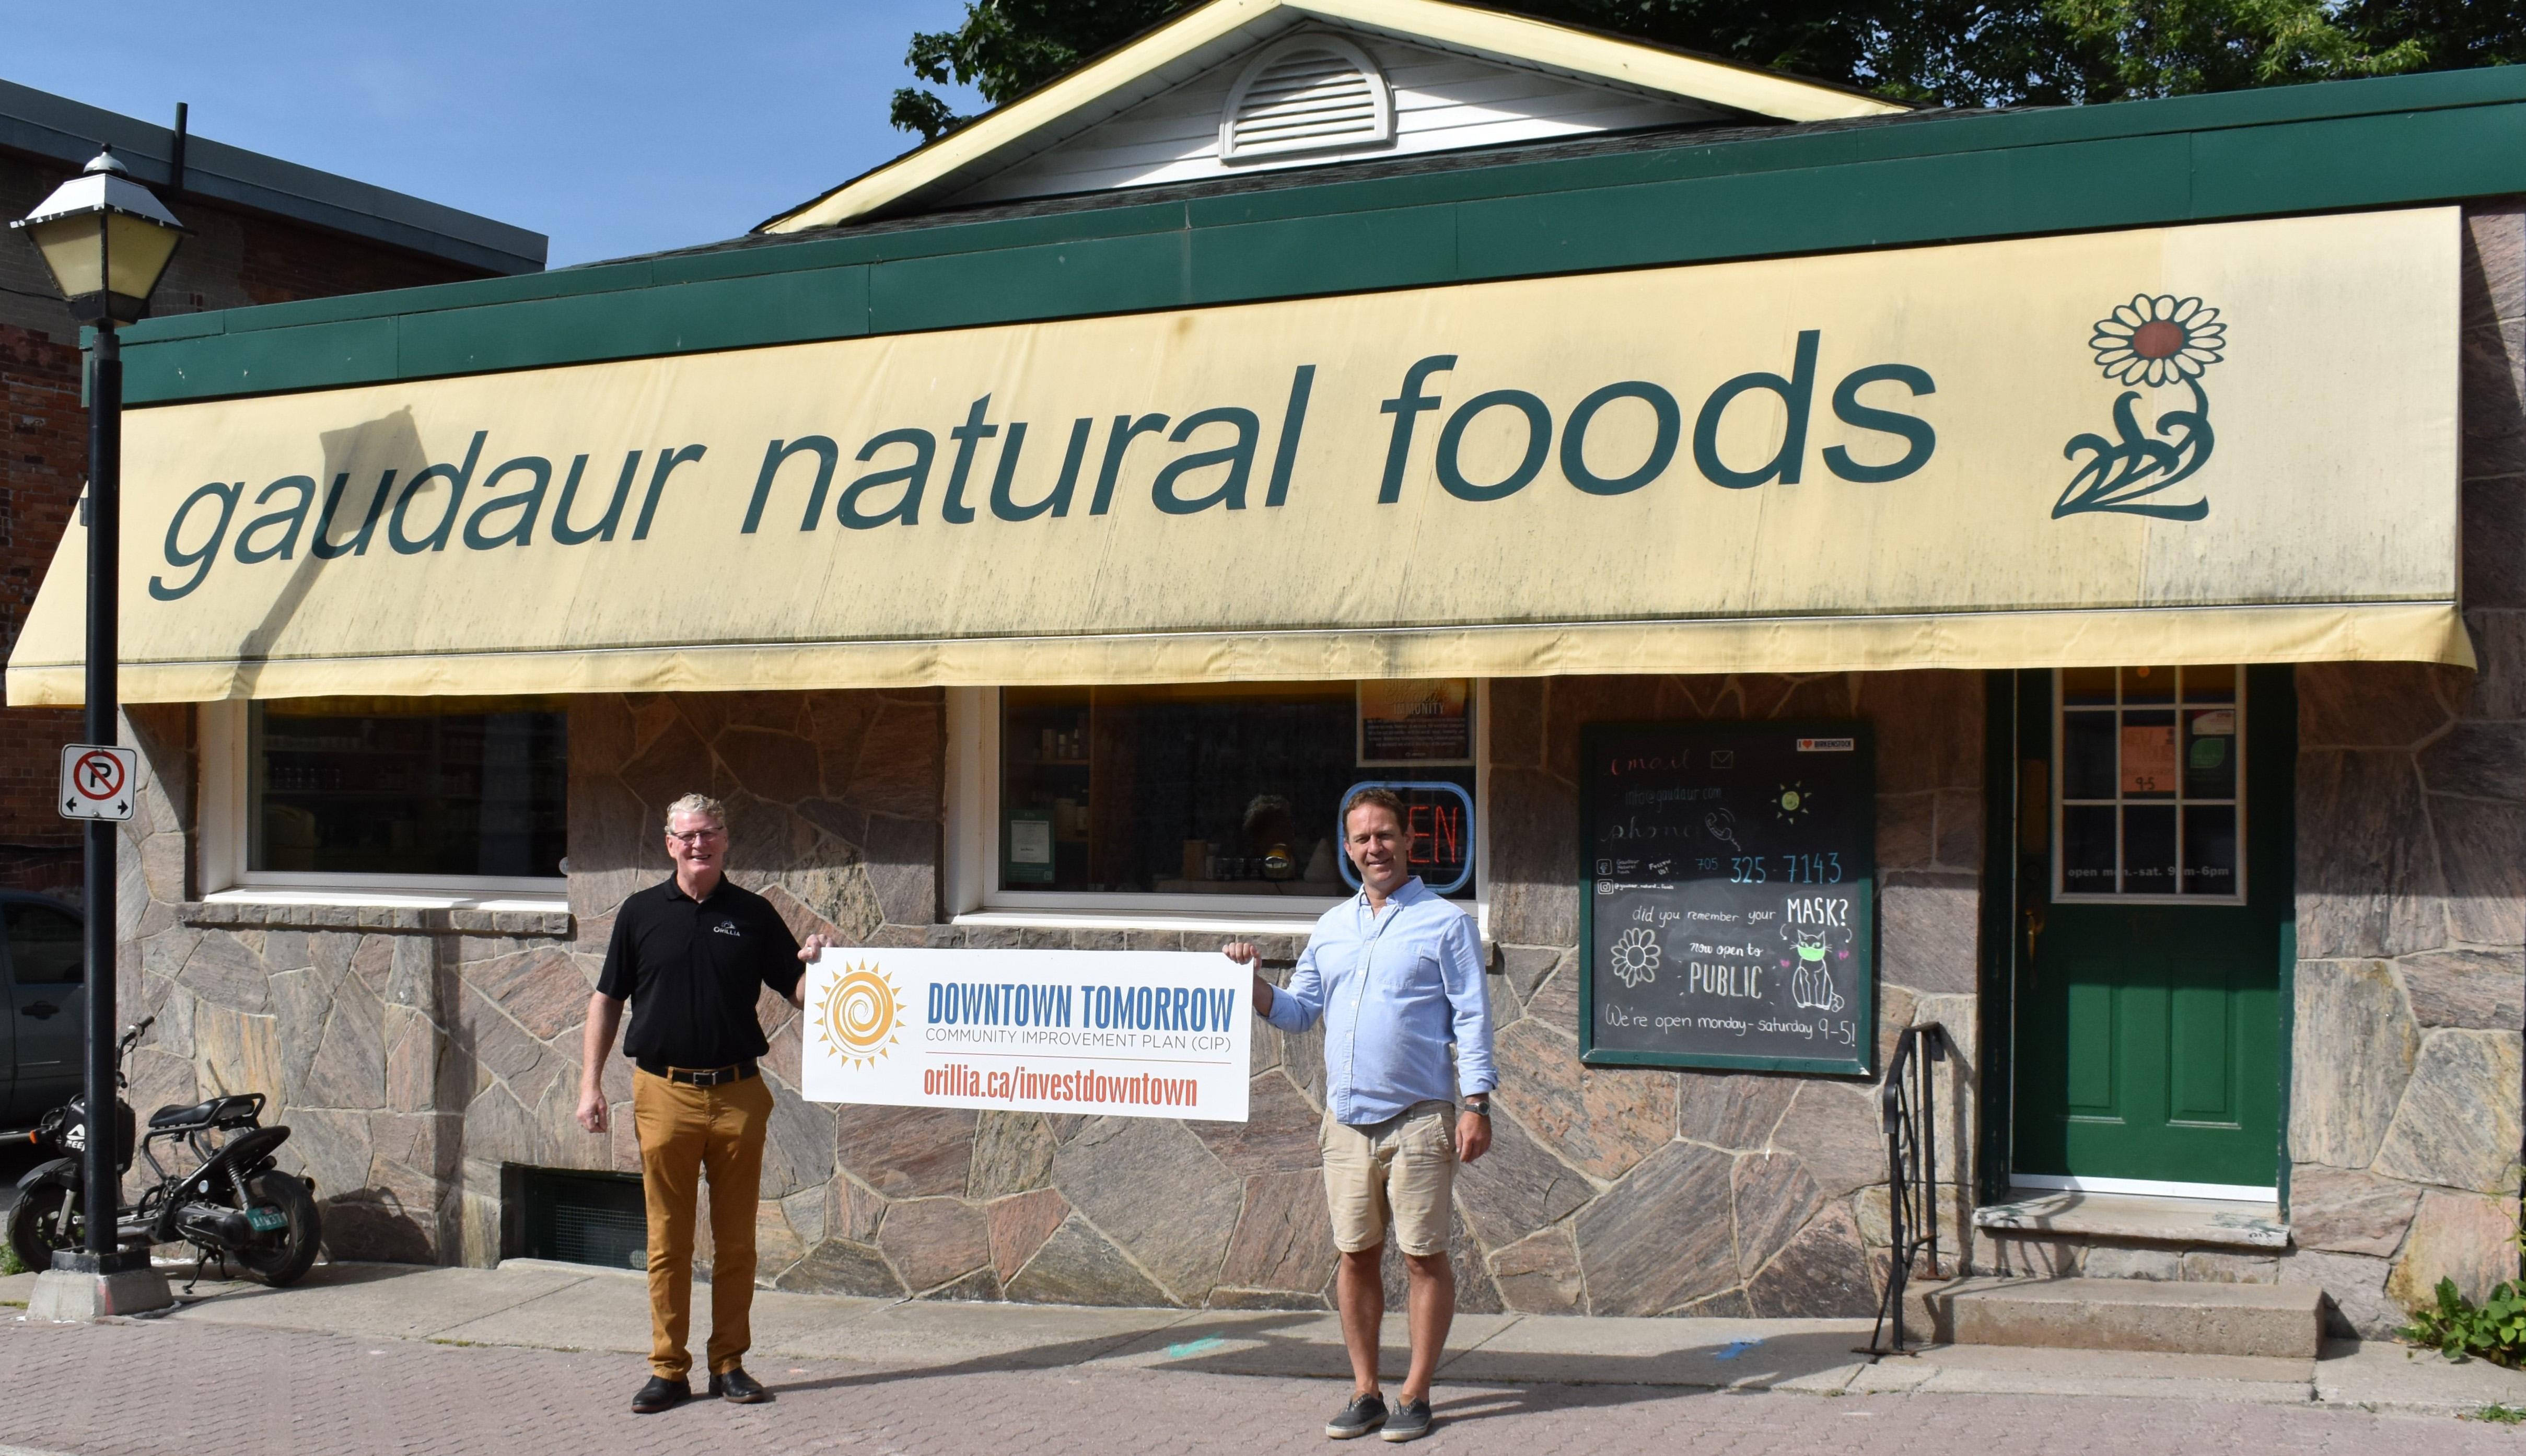 DTCIP Gaudaur Natural Foods